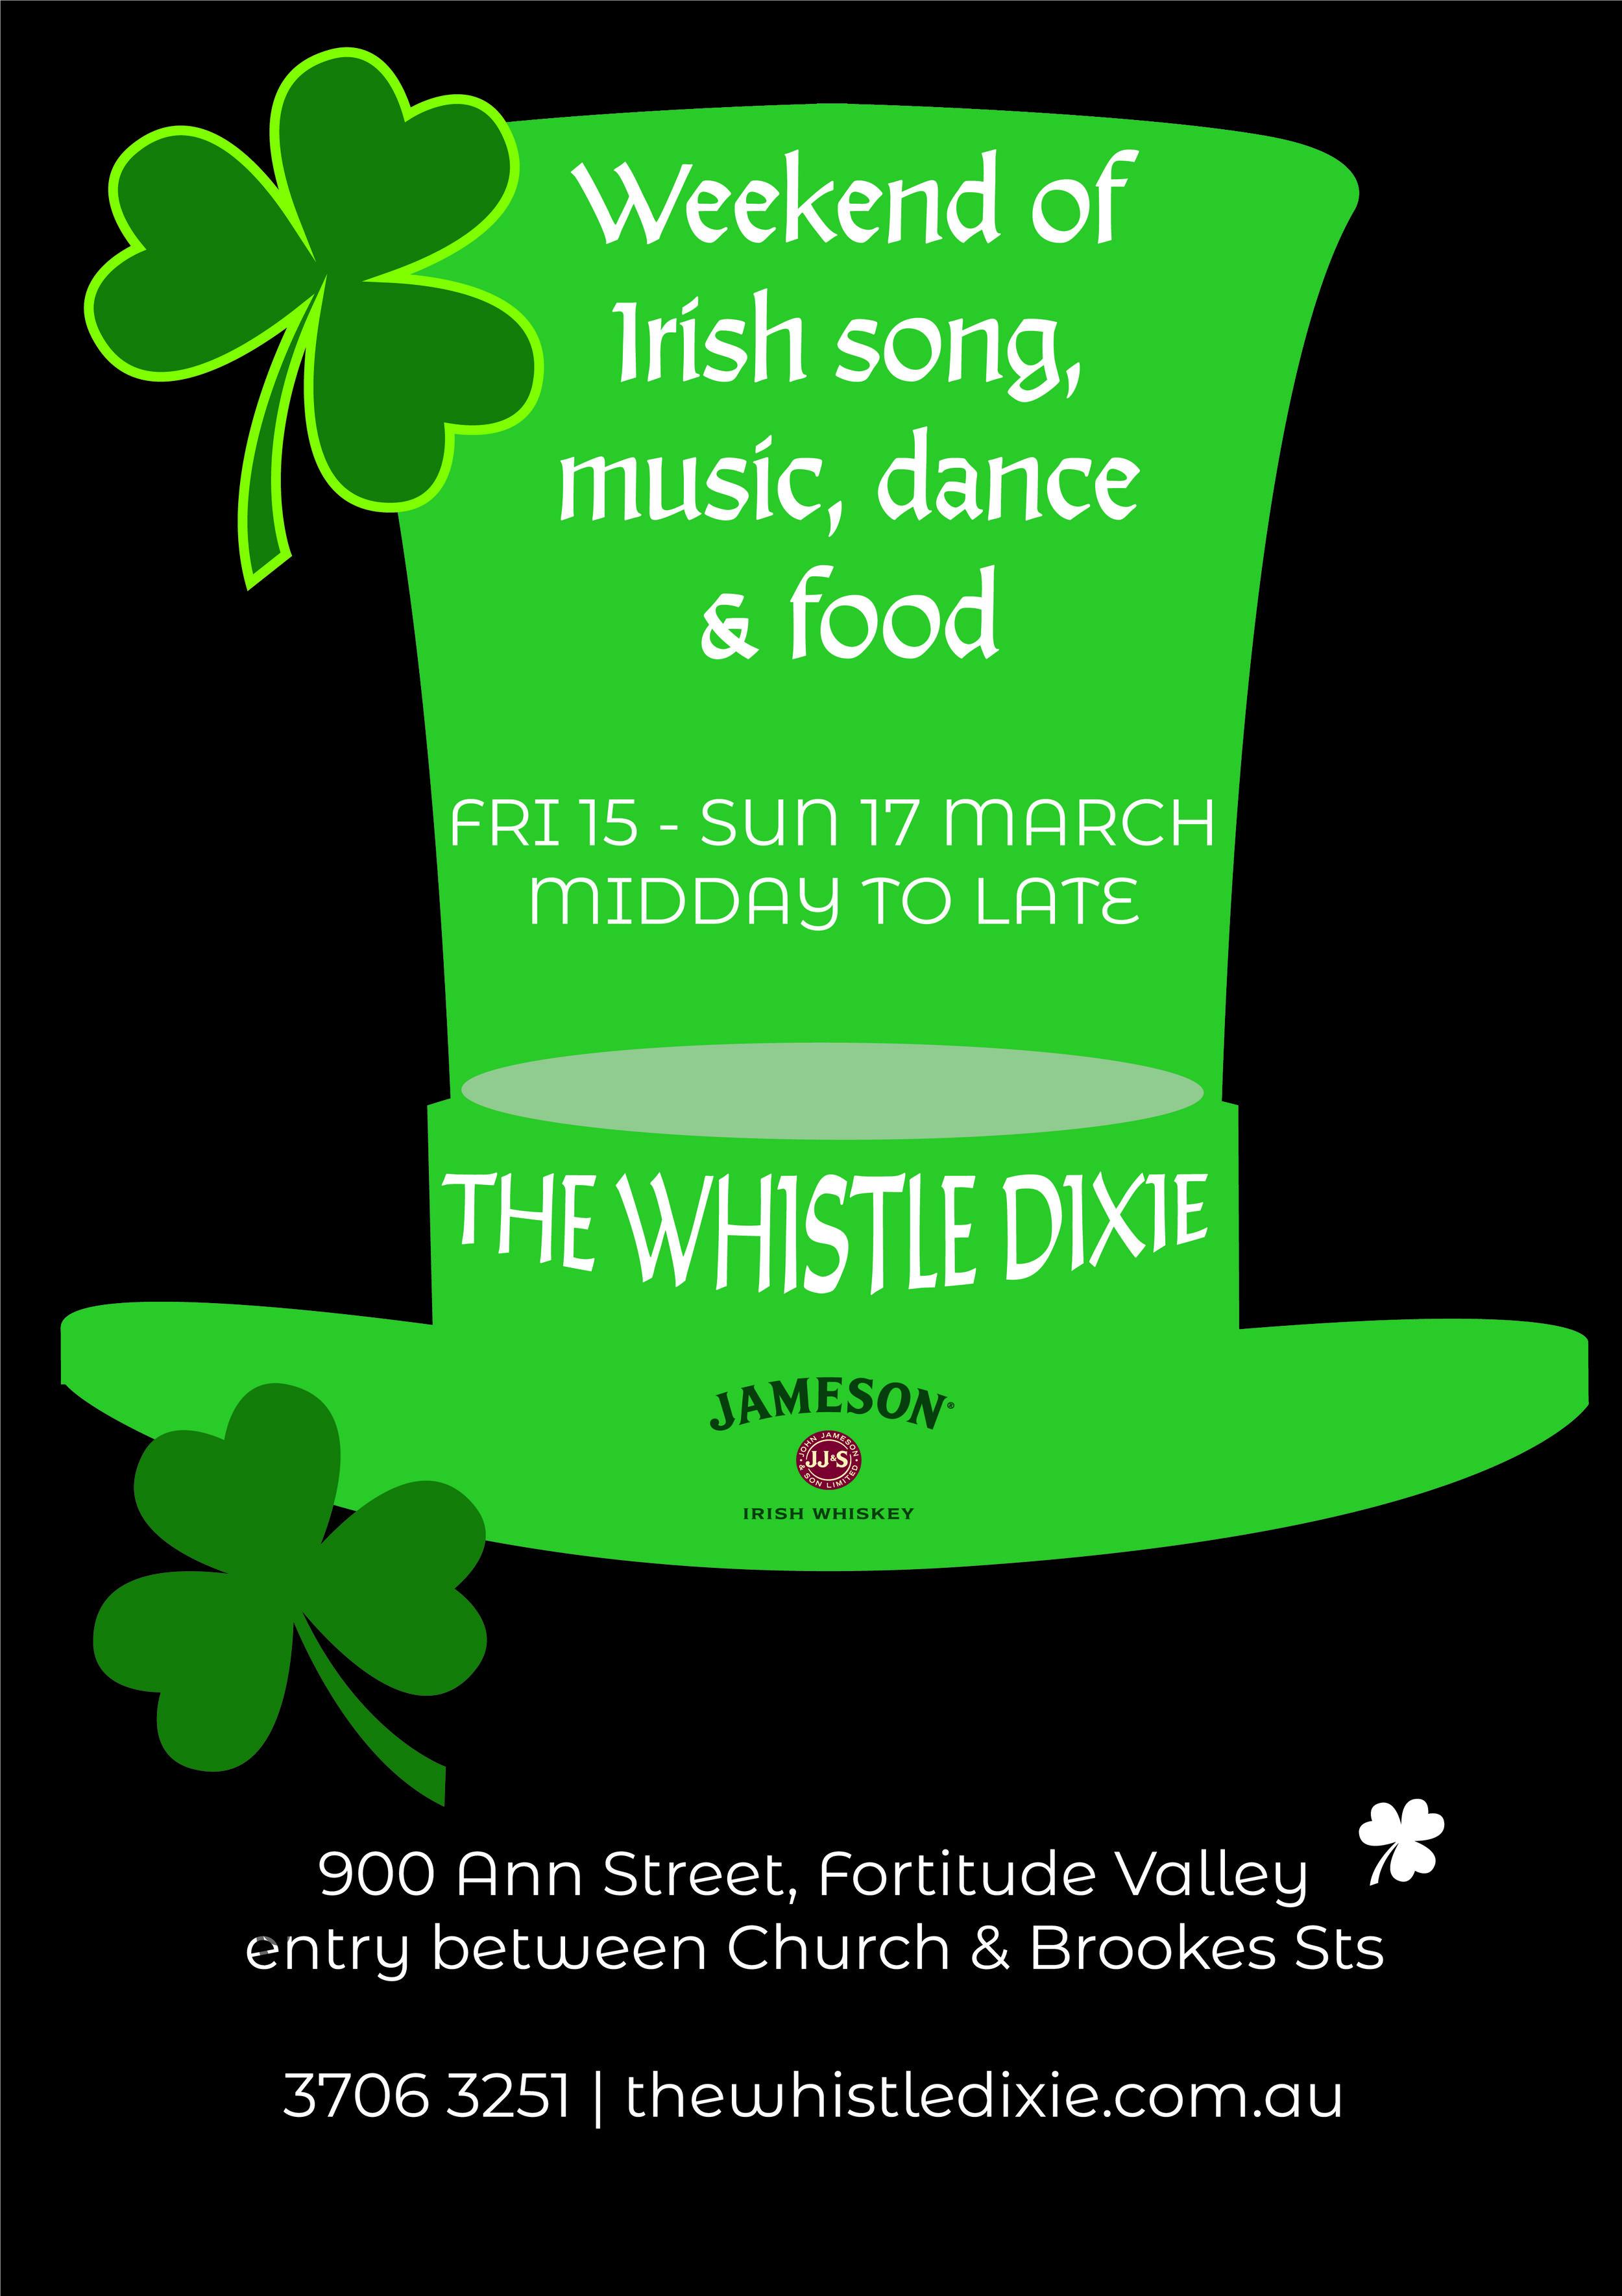 St_Patricks_Poster_Green_Black_FINAL_version2_outlines.jpg